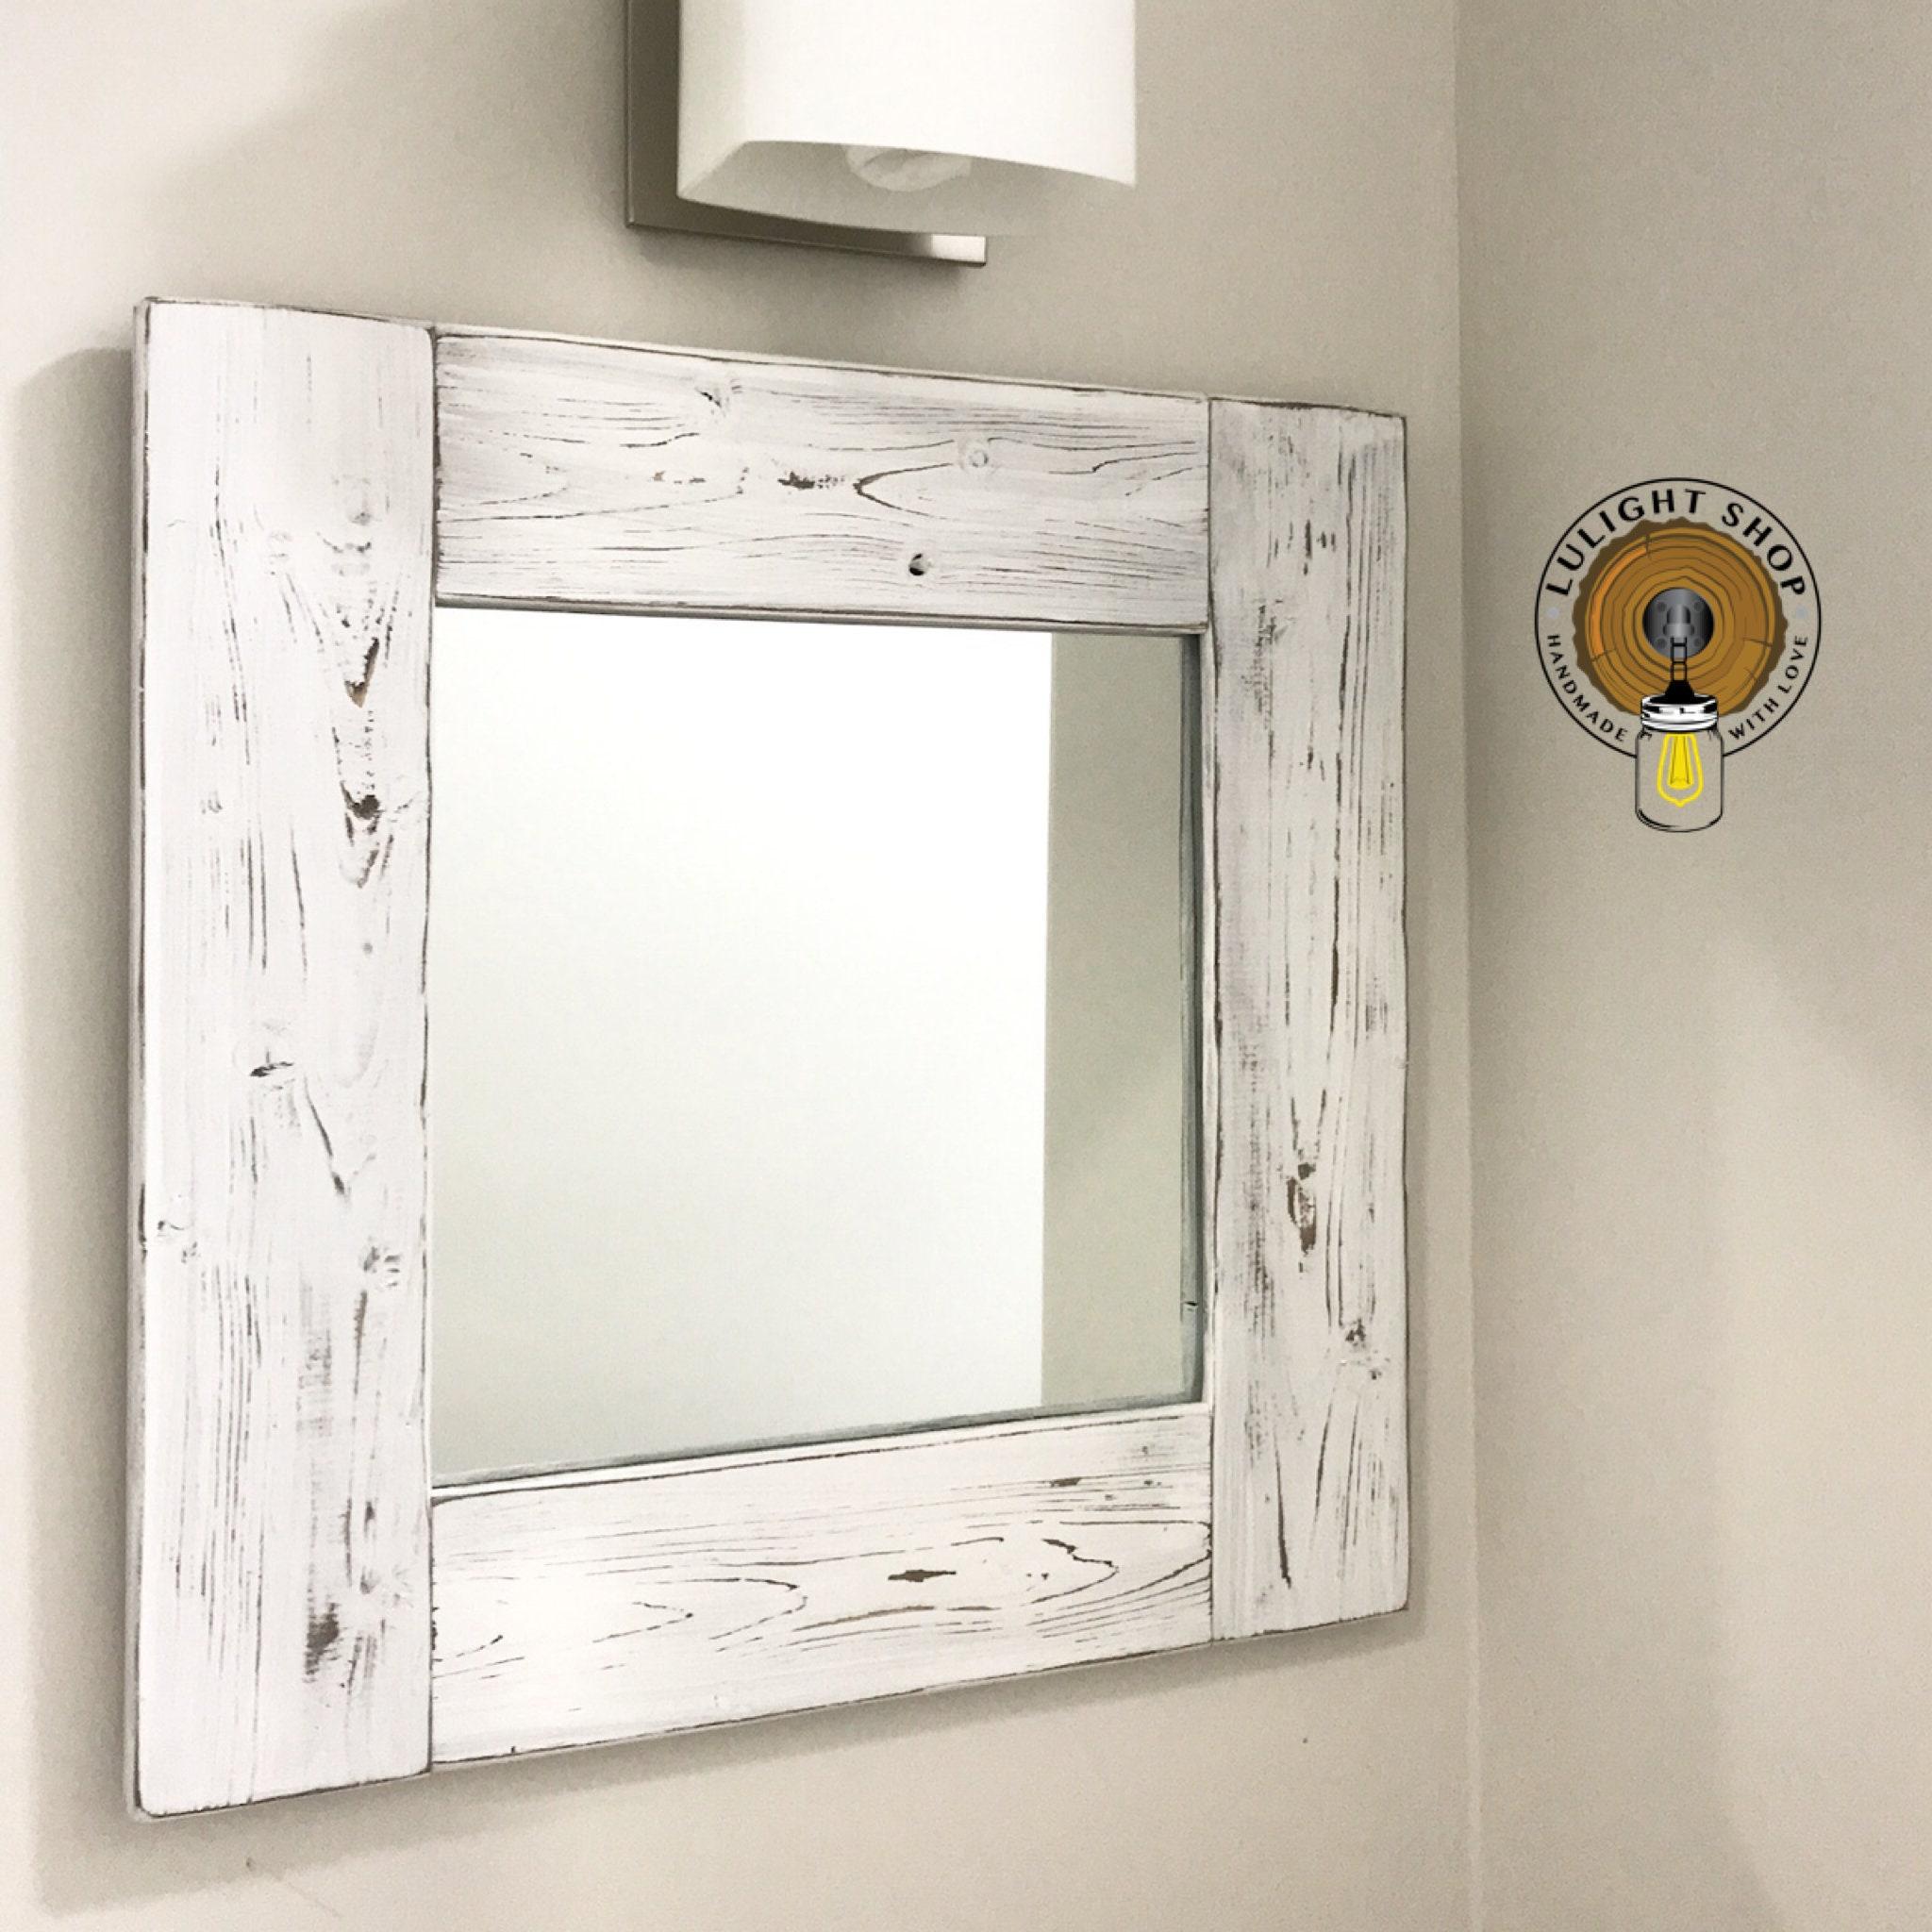 Whitewash Mirror Wood Frame Mirror White Wood Mirror Bathroom Mirror Wall Mirror Decorative Mirrors Small Mirror Large Mirror Beach